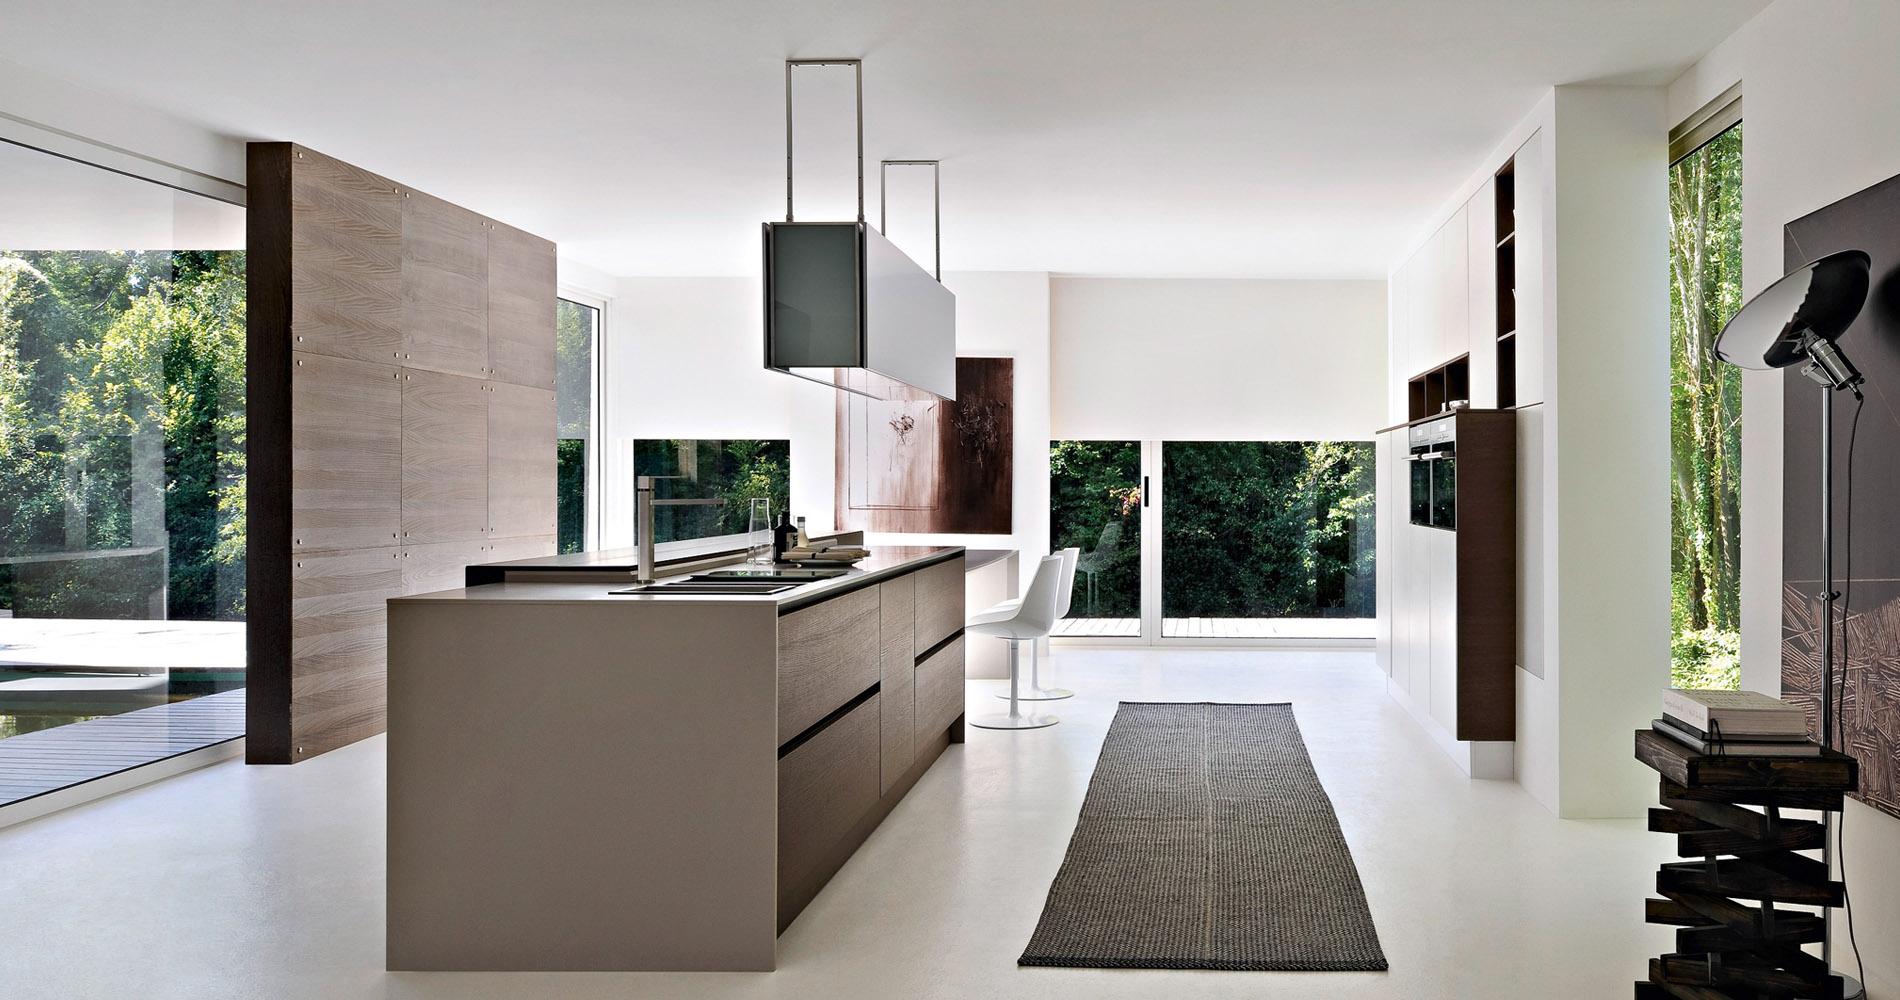 studio mebli kuchennych marek sobczak meble kuchenne wroc�aw